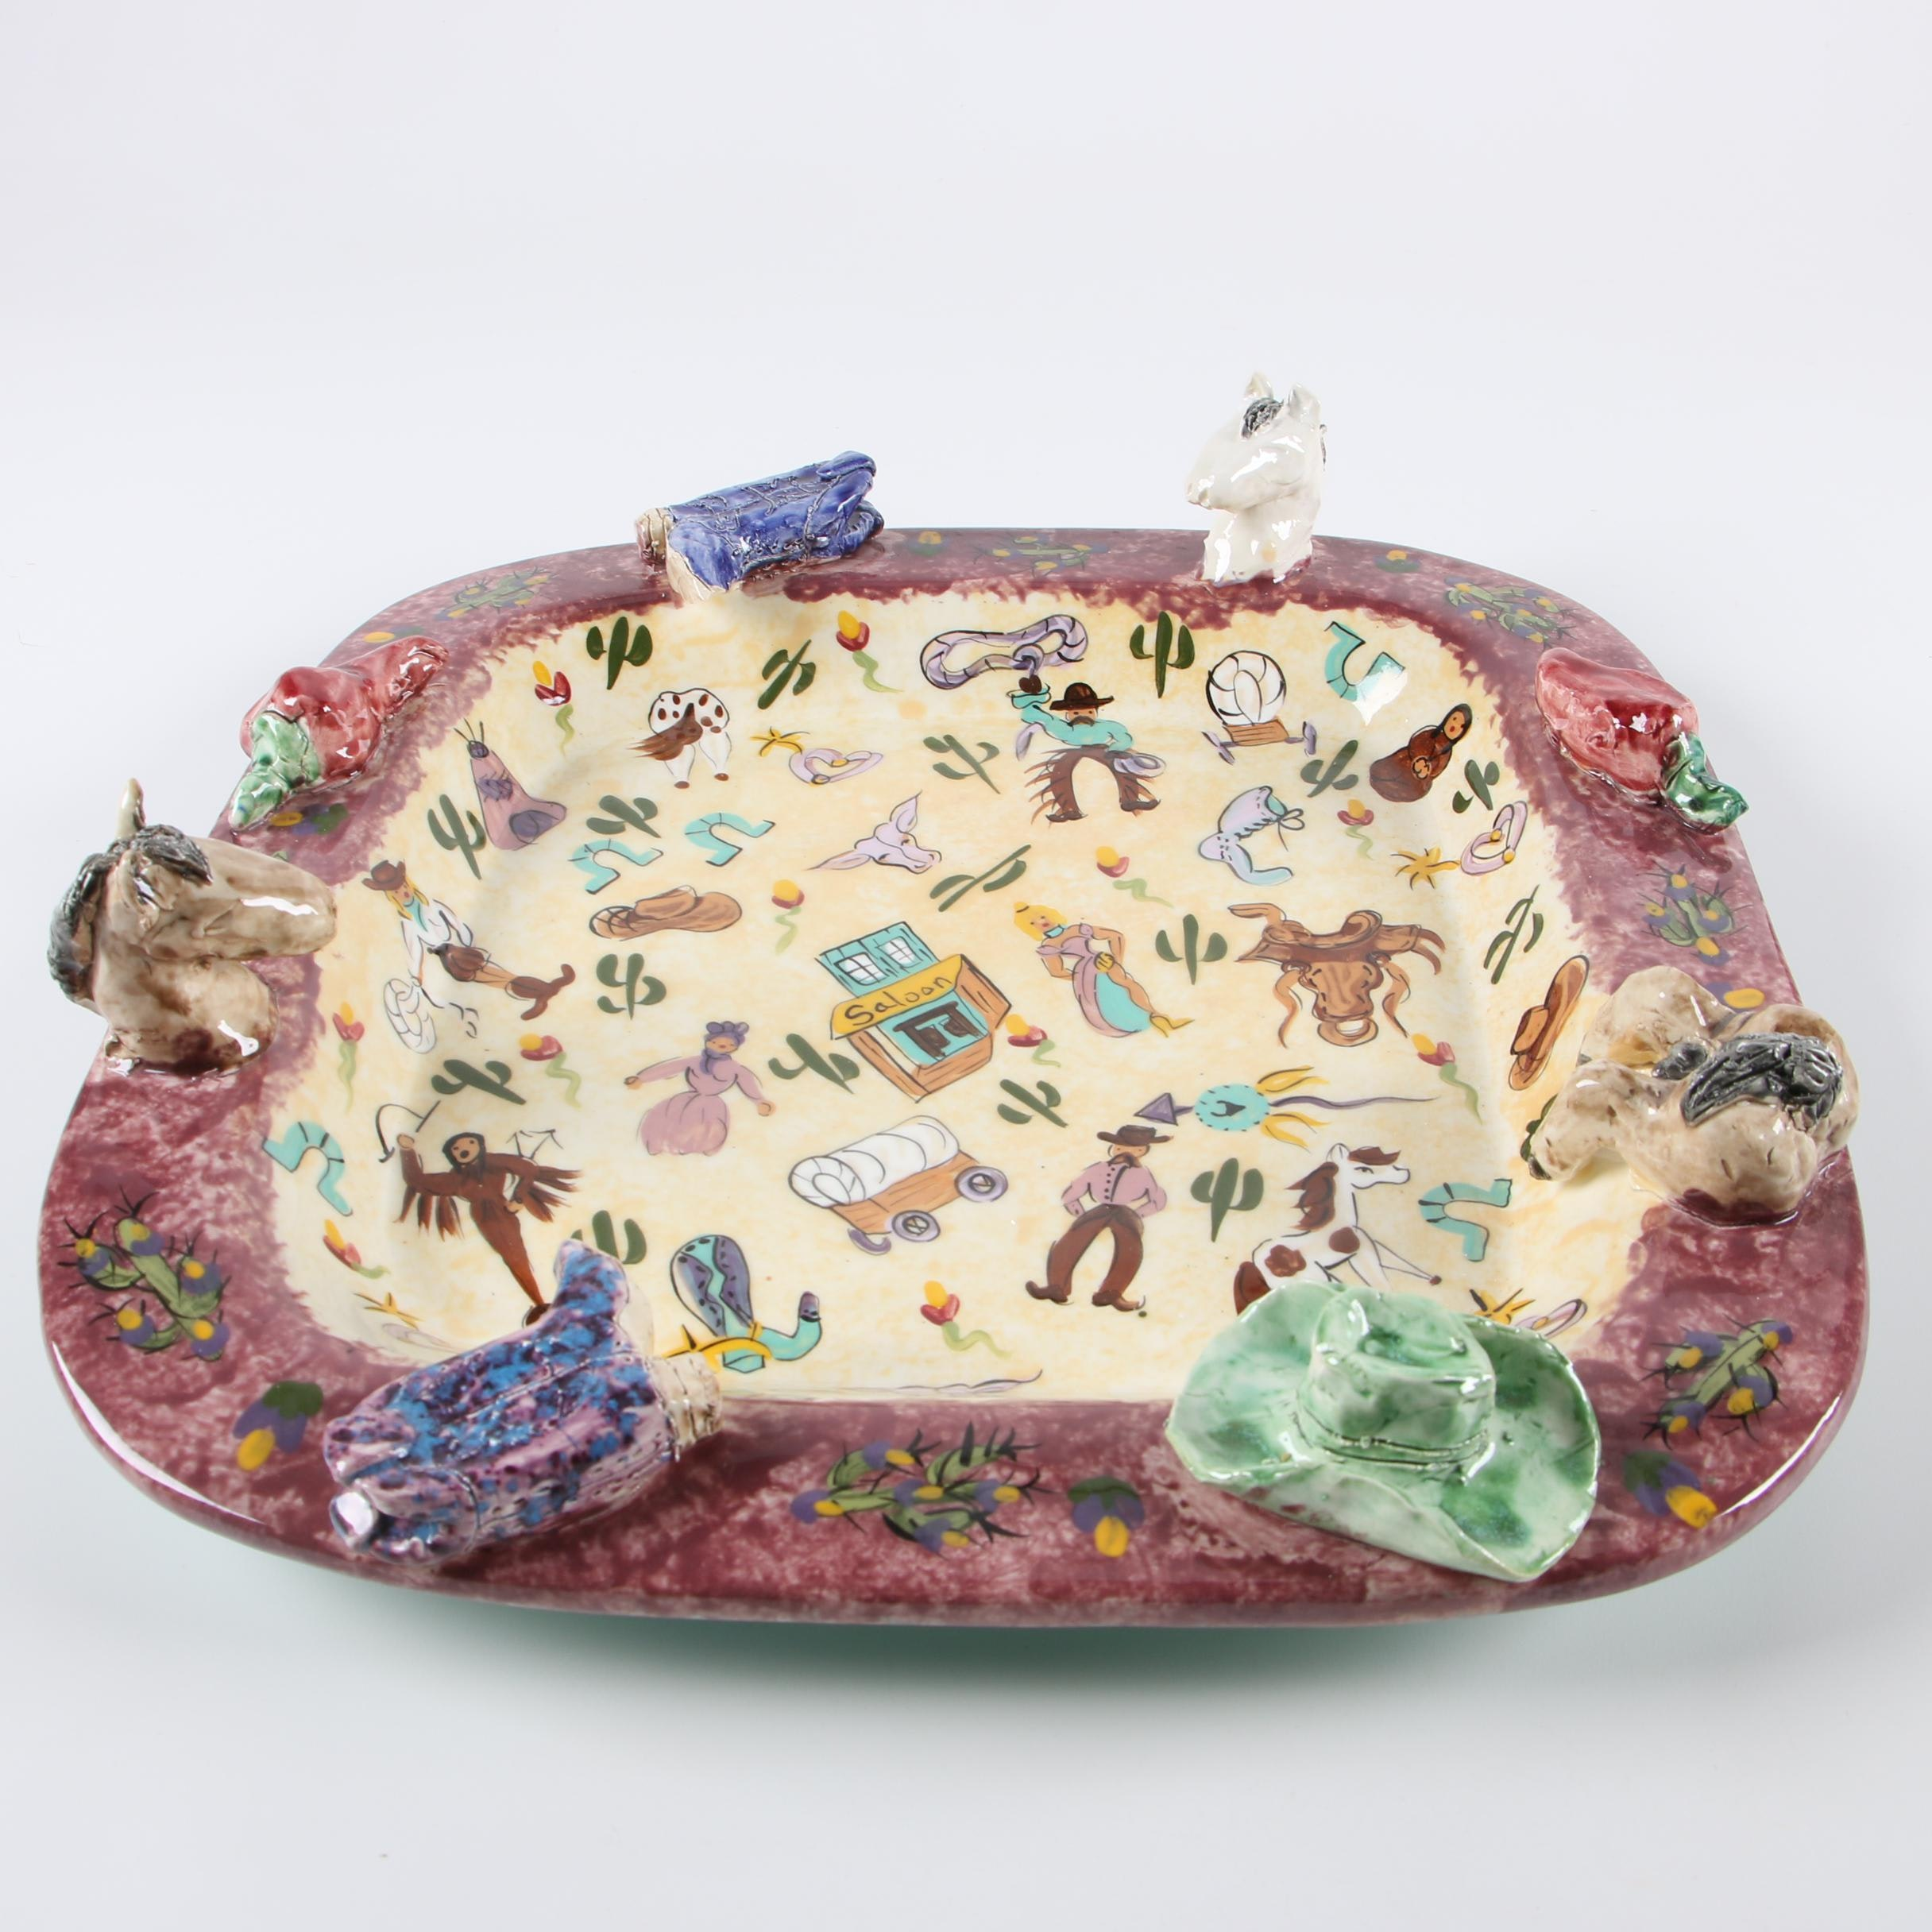 Lesäl Ceramics Southwestern Inspired Serving Tray